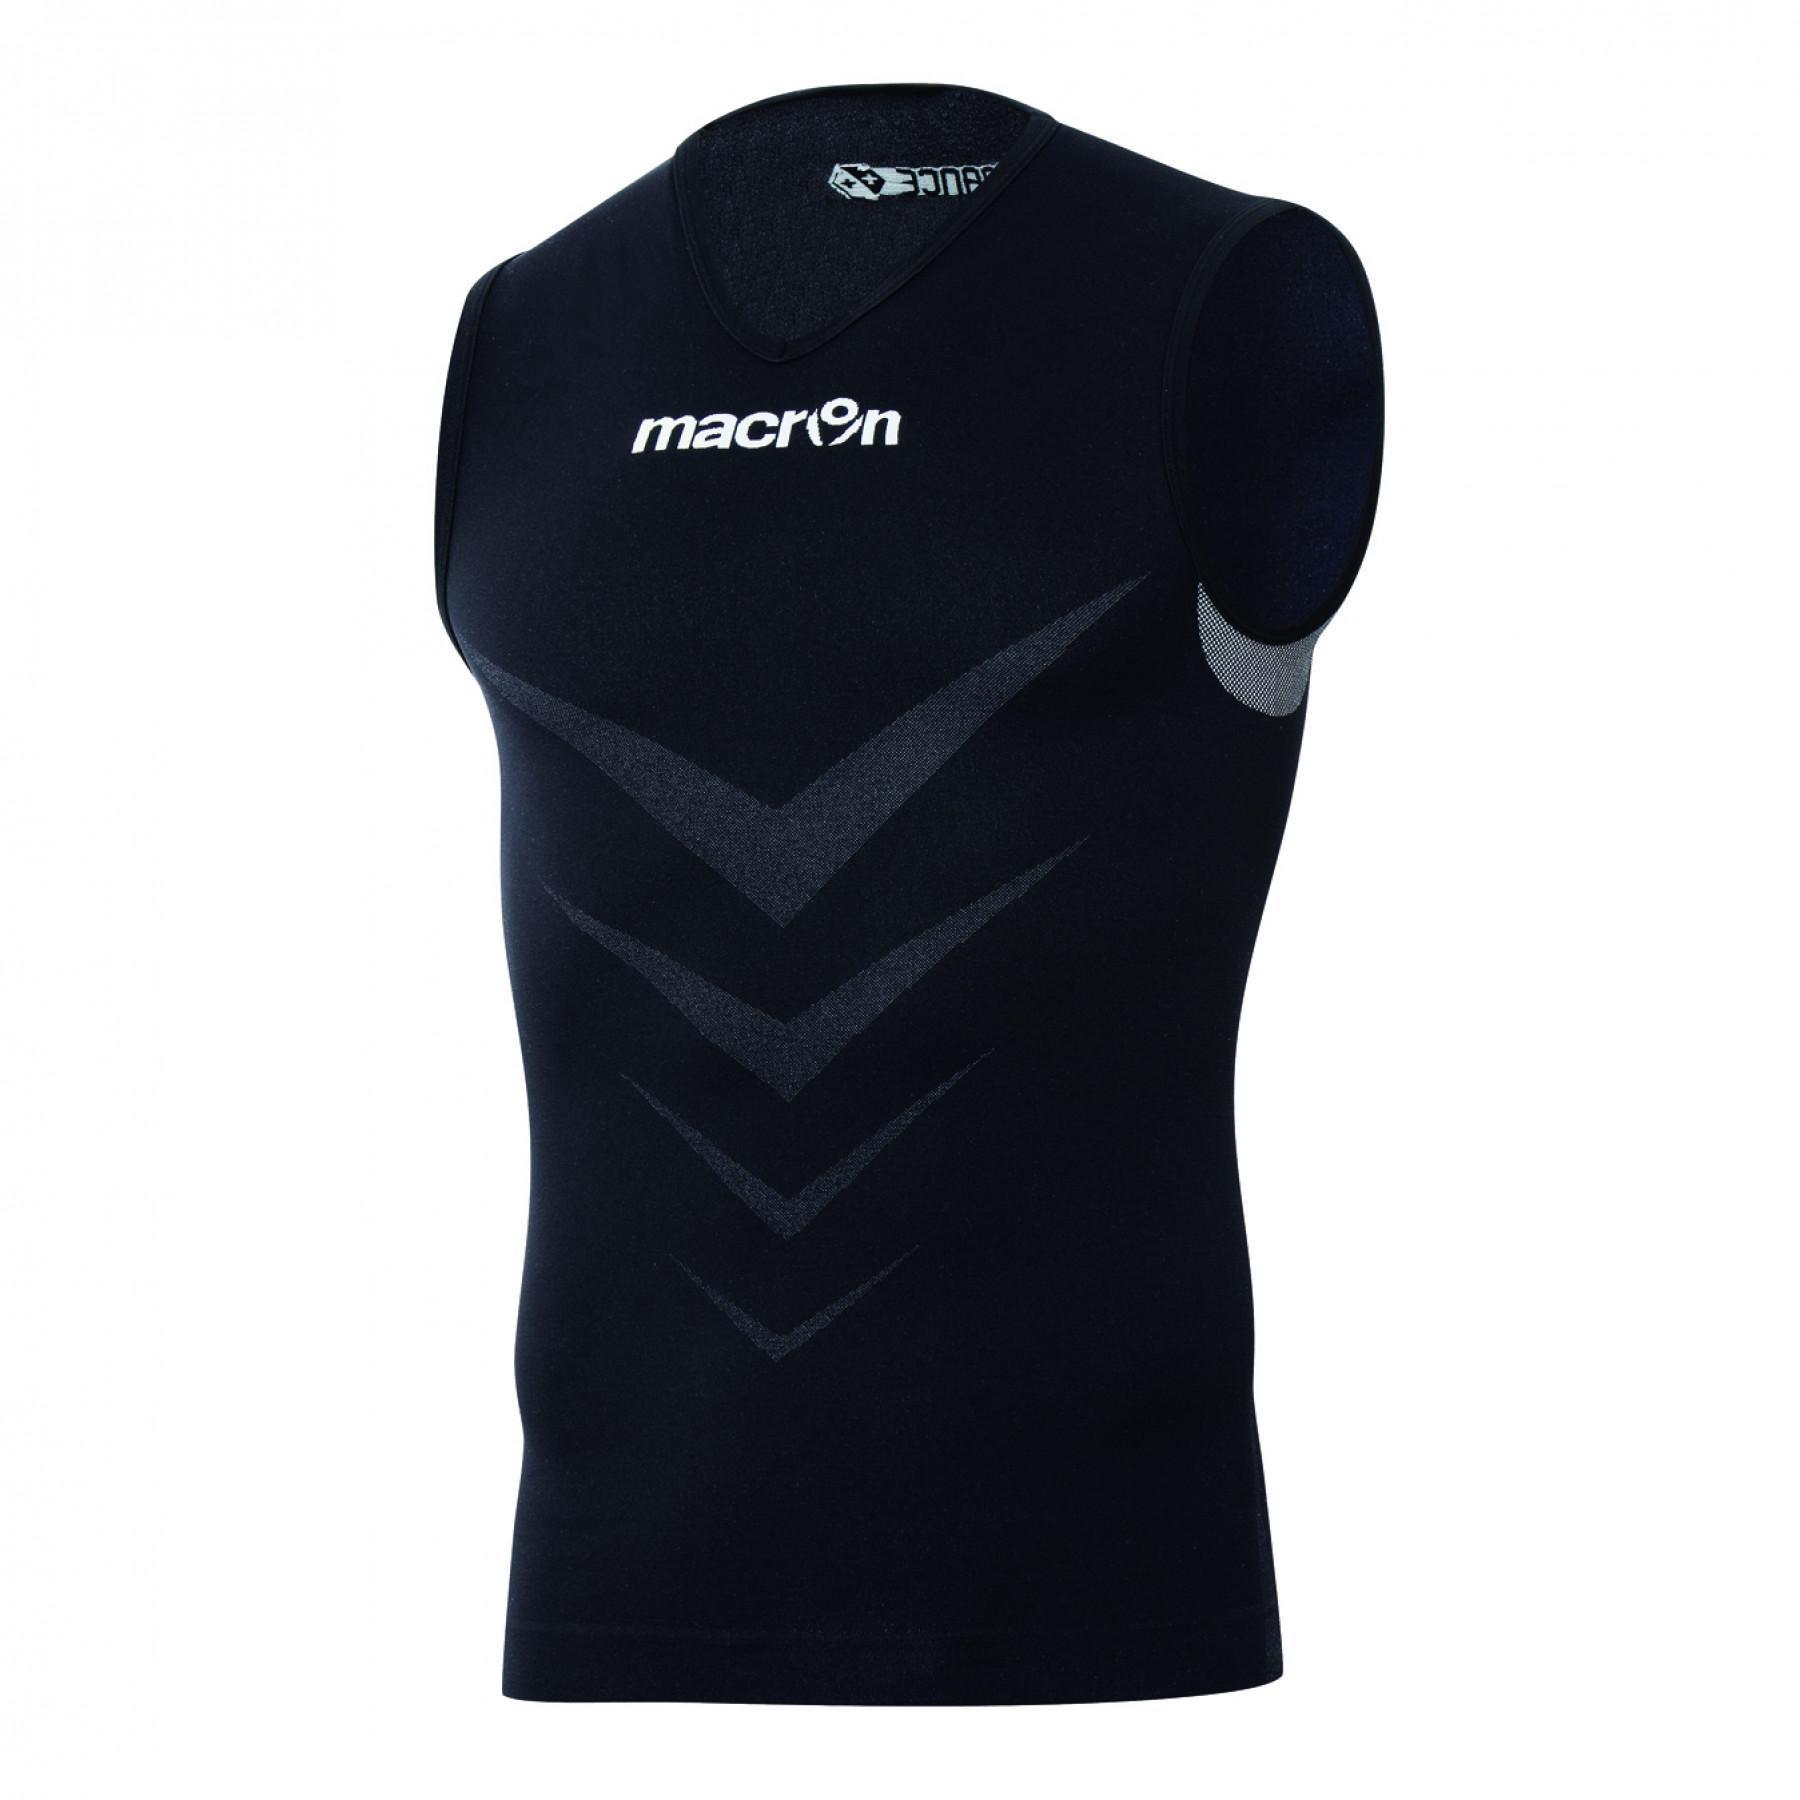 Performance++ Sleeveless compression jersey